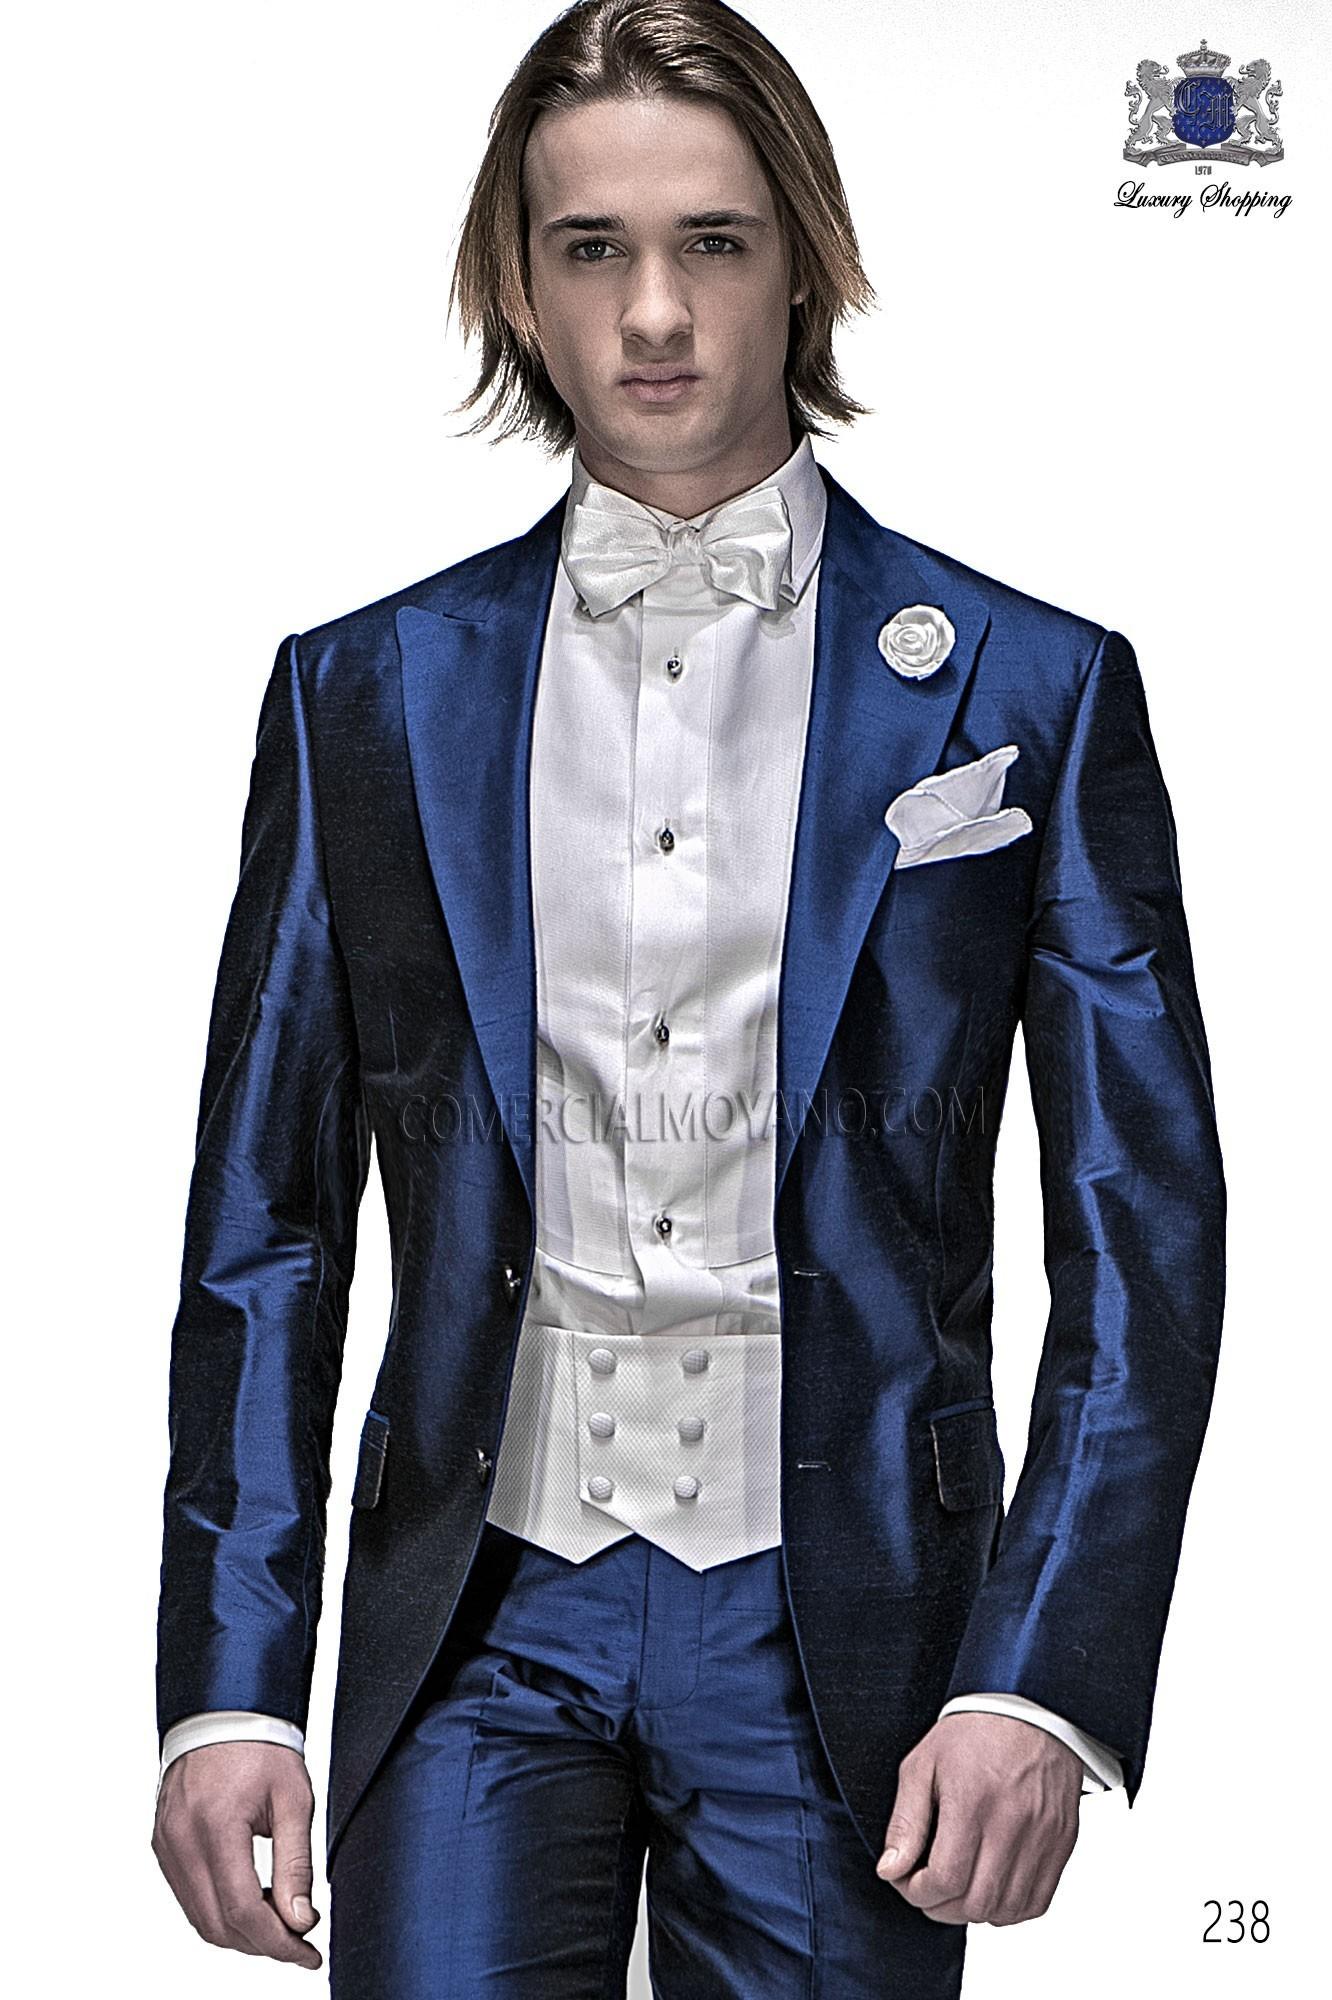 Traje Fashion de novio azul modelo: 238 Ottavio Nuccio Gala colección Fashion